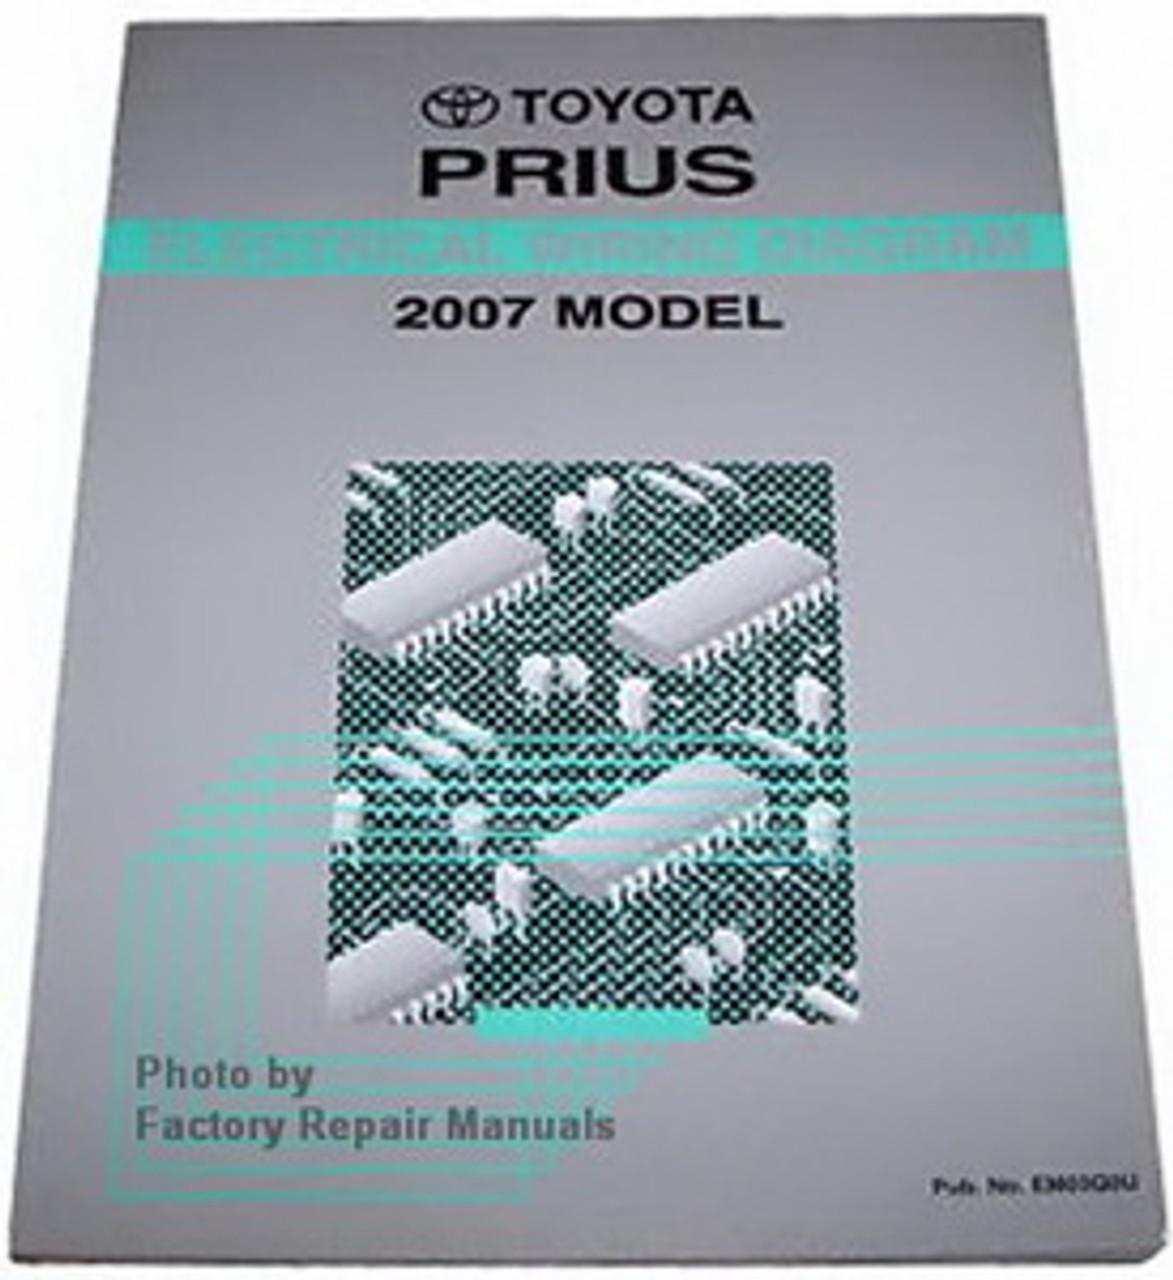 2007 Toyota Prius Electrical Wiring Diagrams